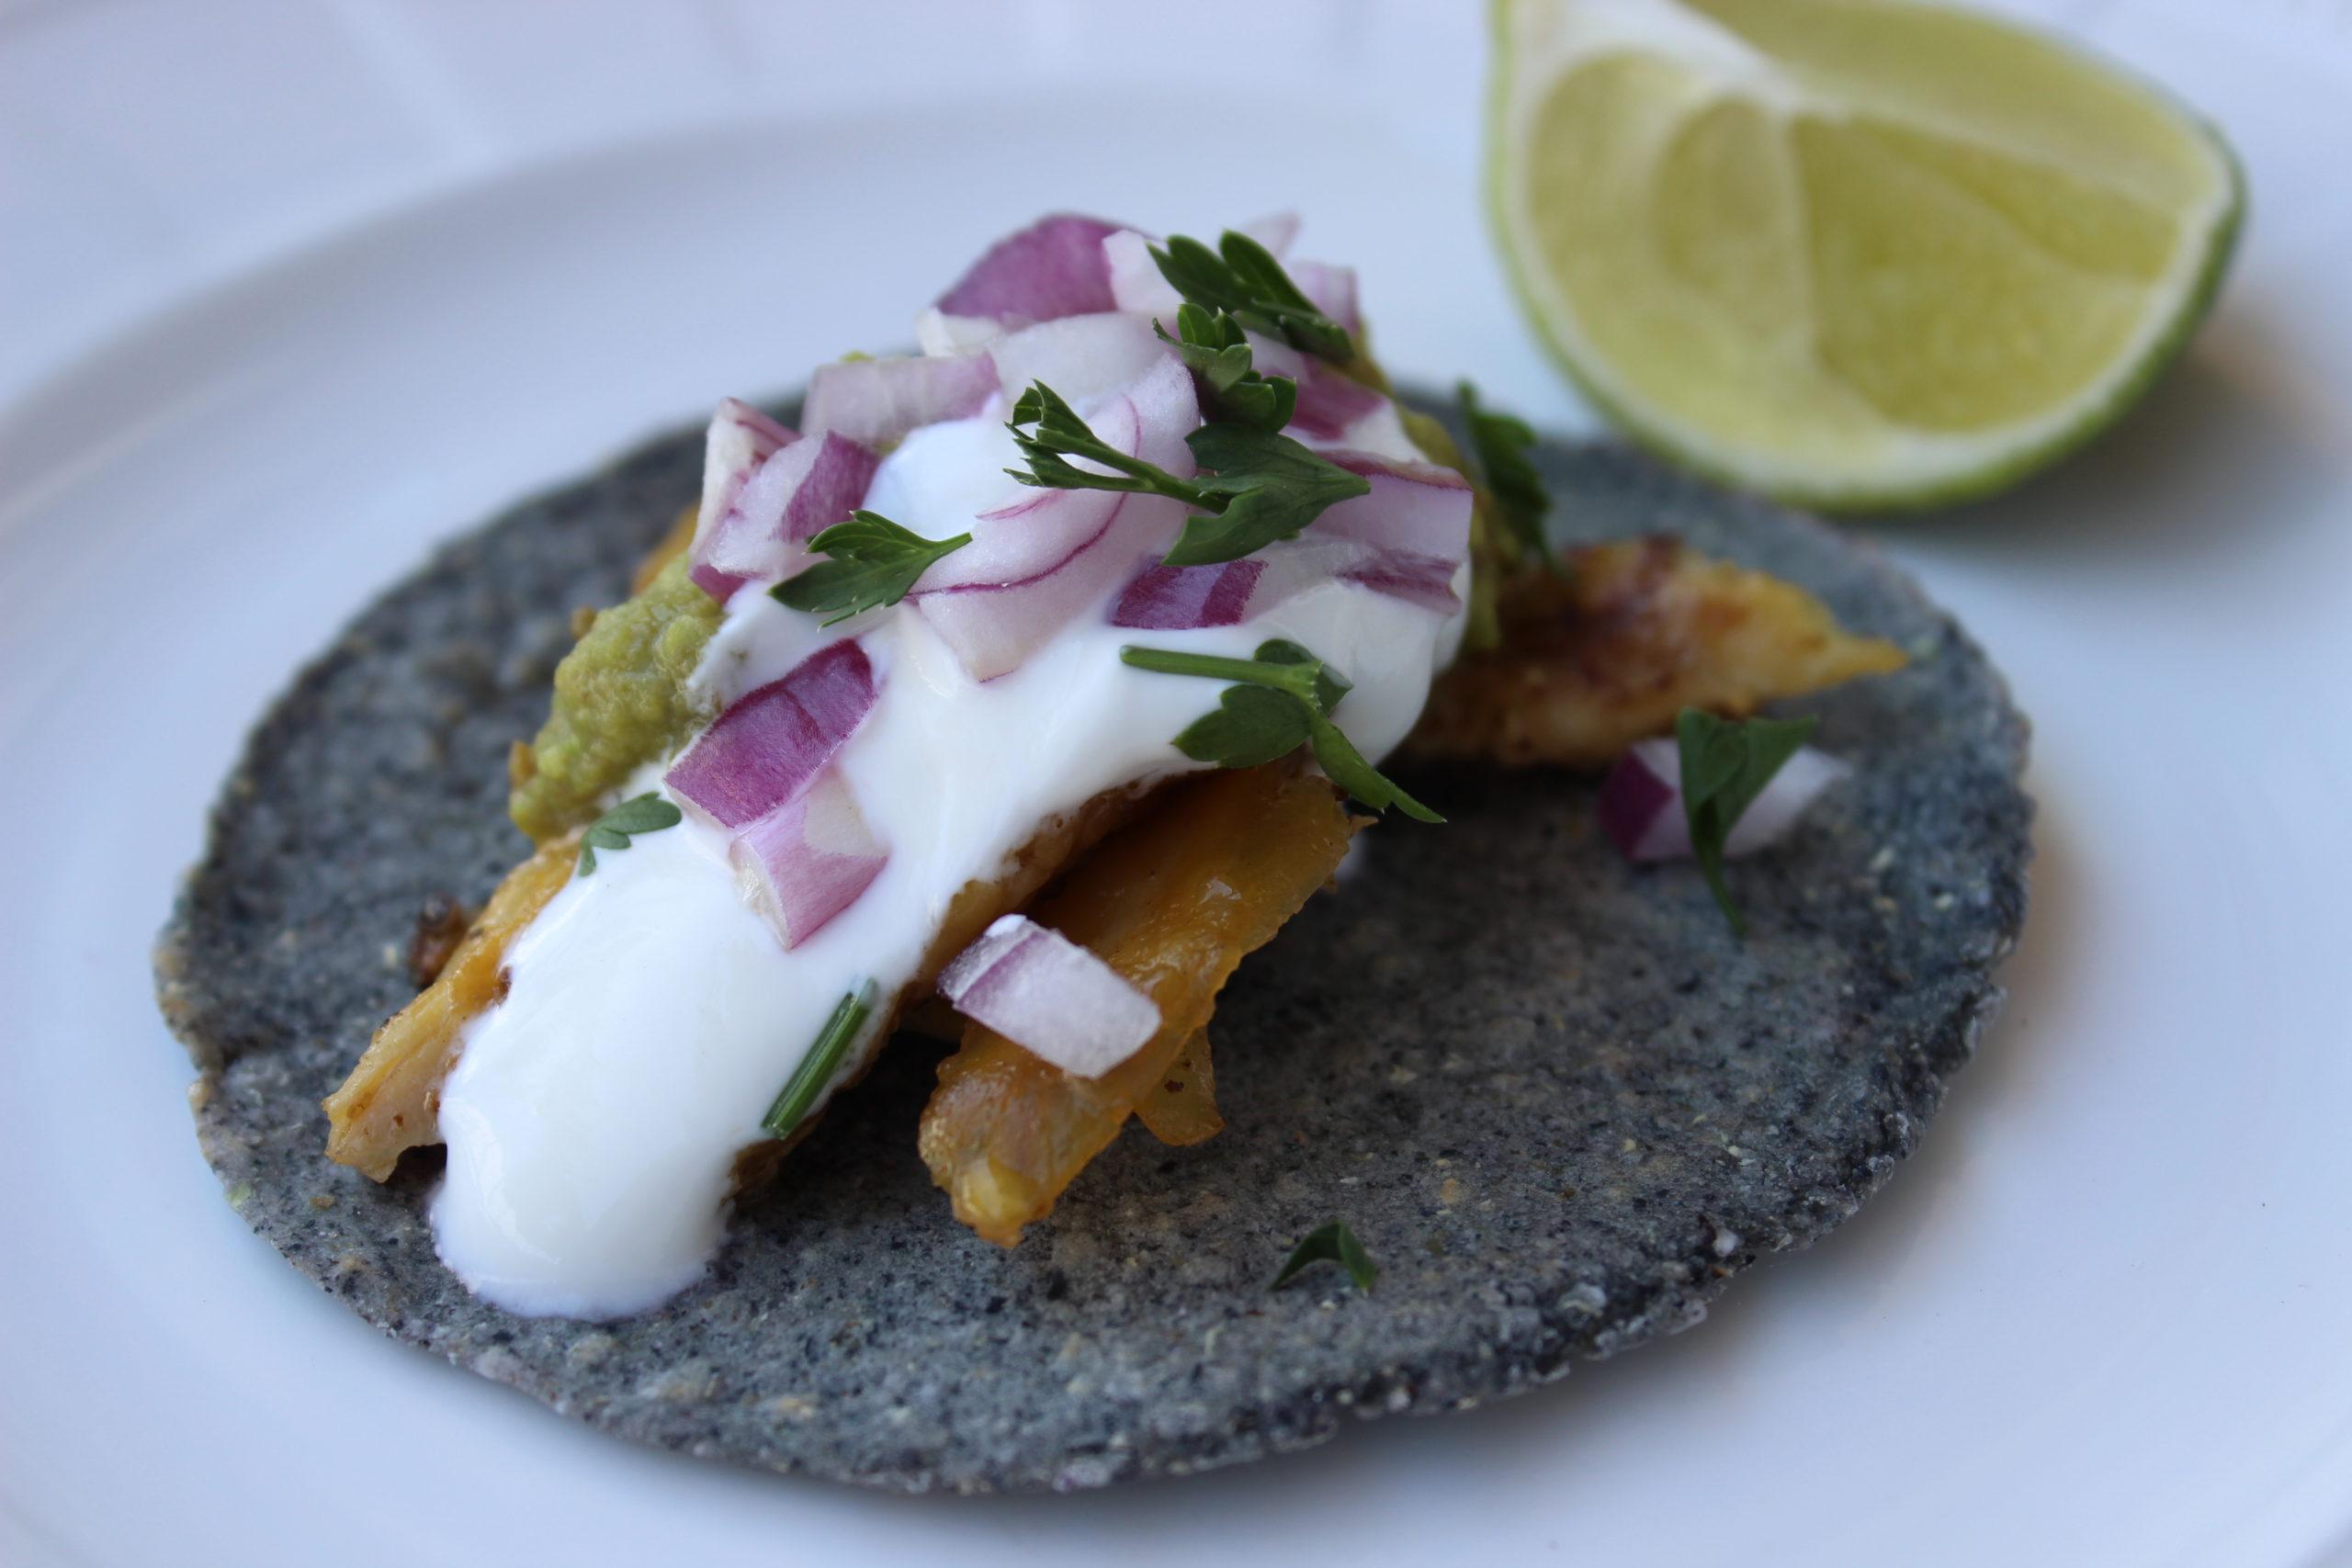 Kuracie tacos